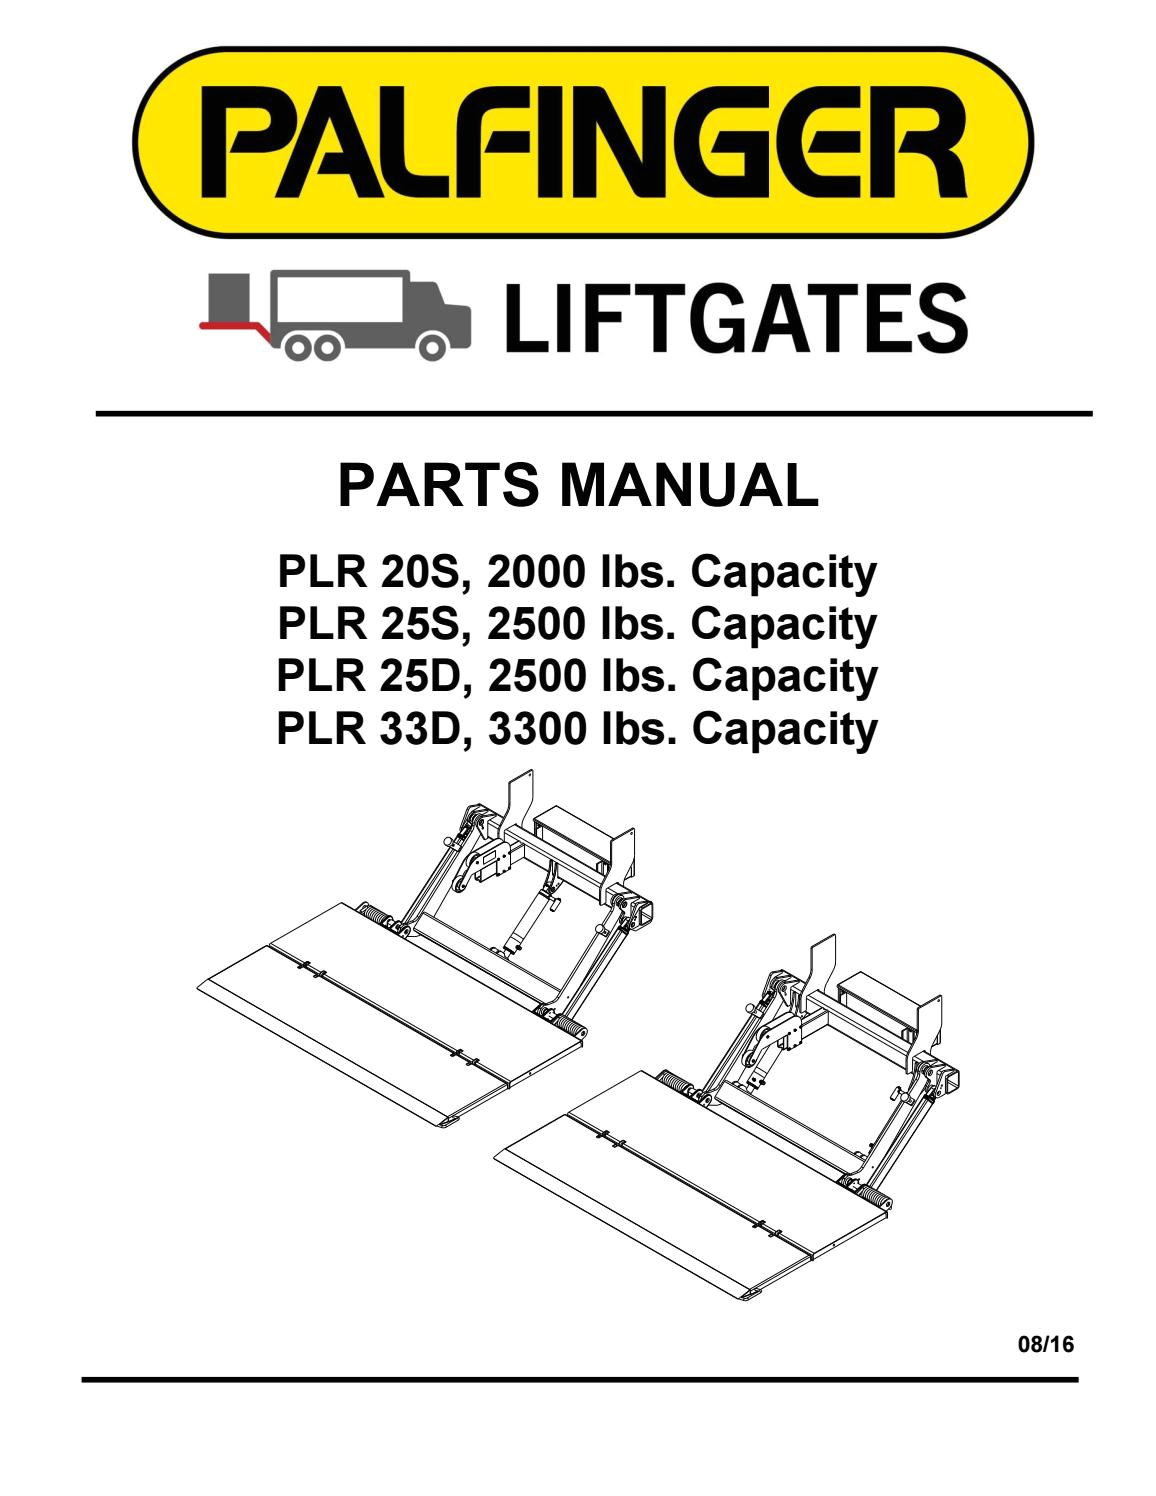 interlift plr liftgate parts manual